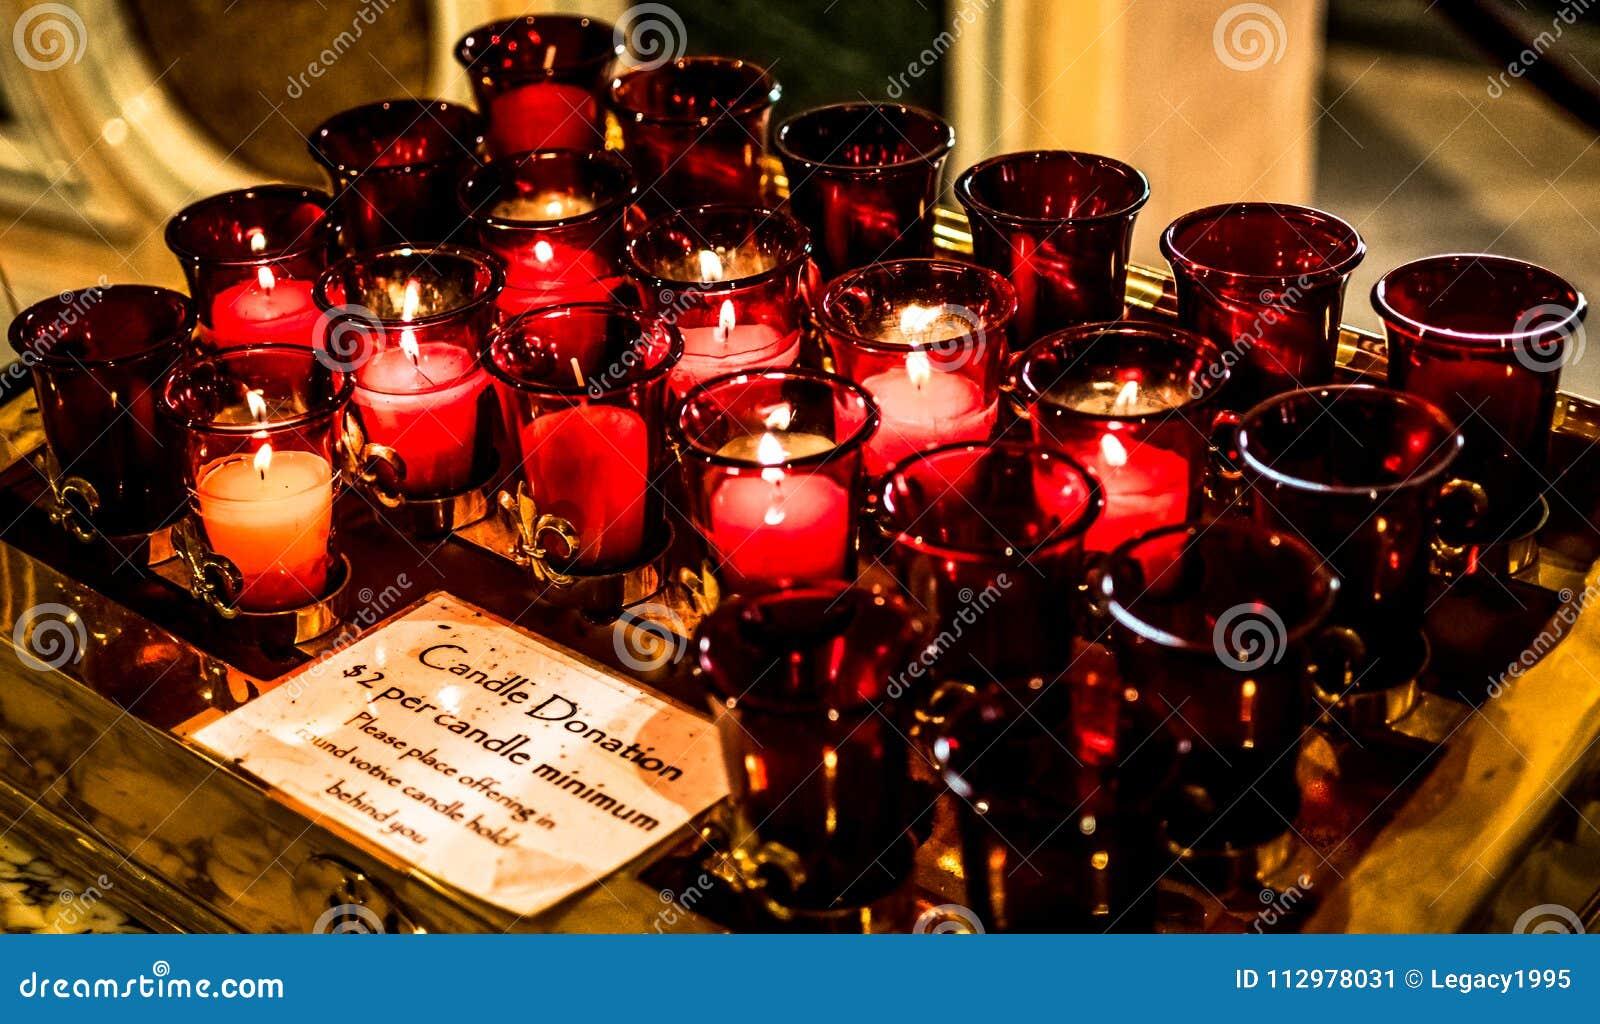 Saint Louis Basilica Side Altar Red Prayer Candles